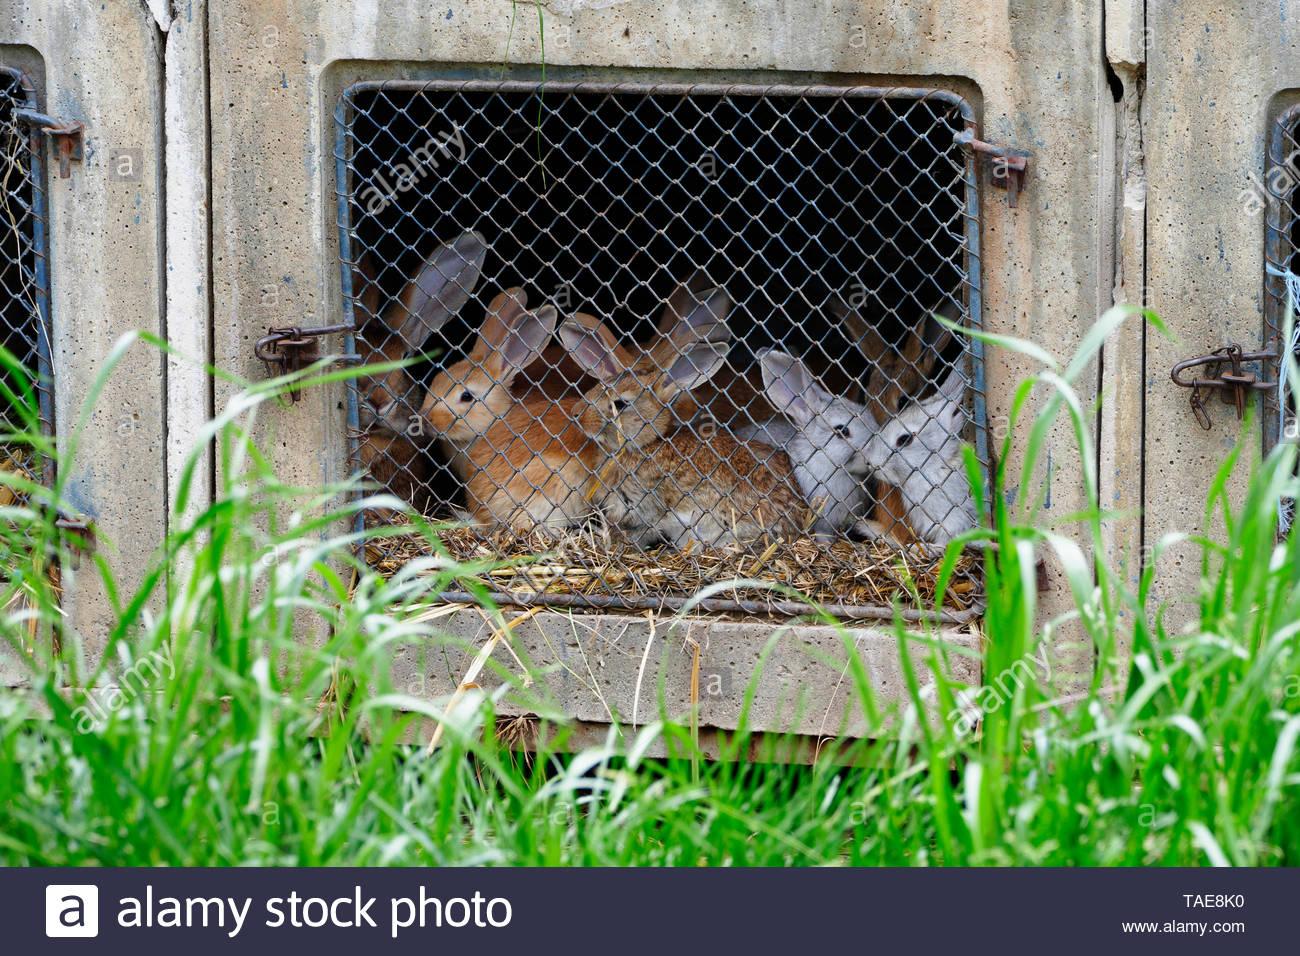 Breeding rabbits in an old farm, North Mayenne, Pays de la Loire, France - Stock Image